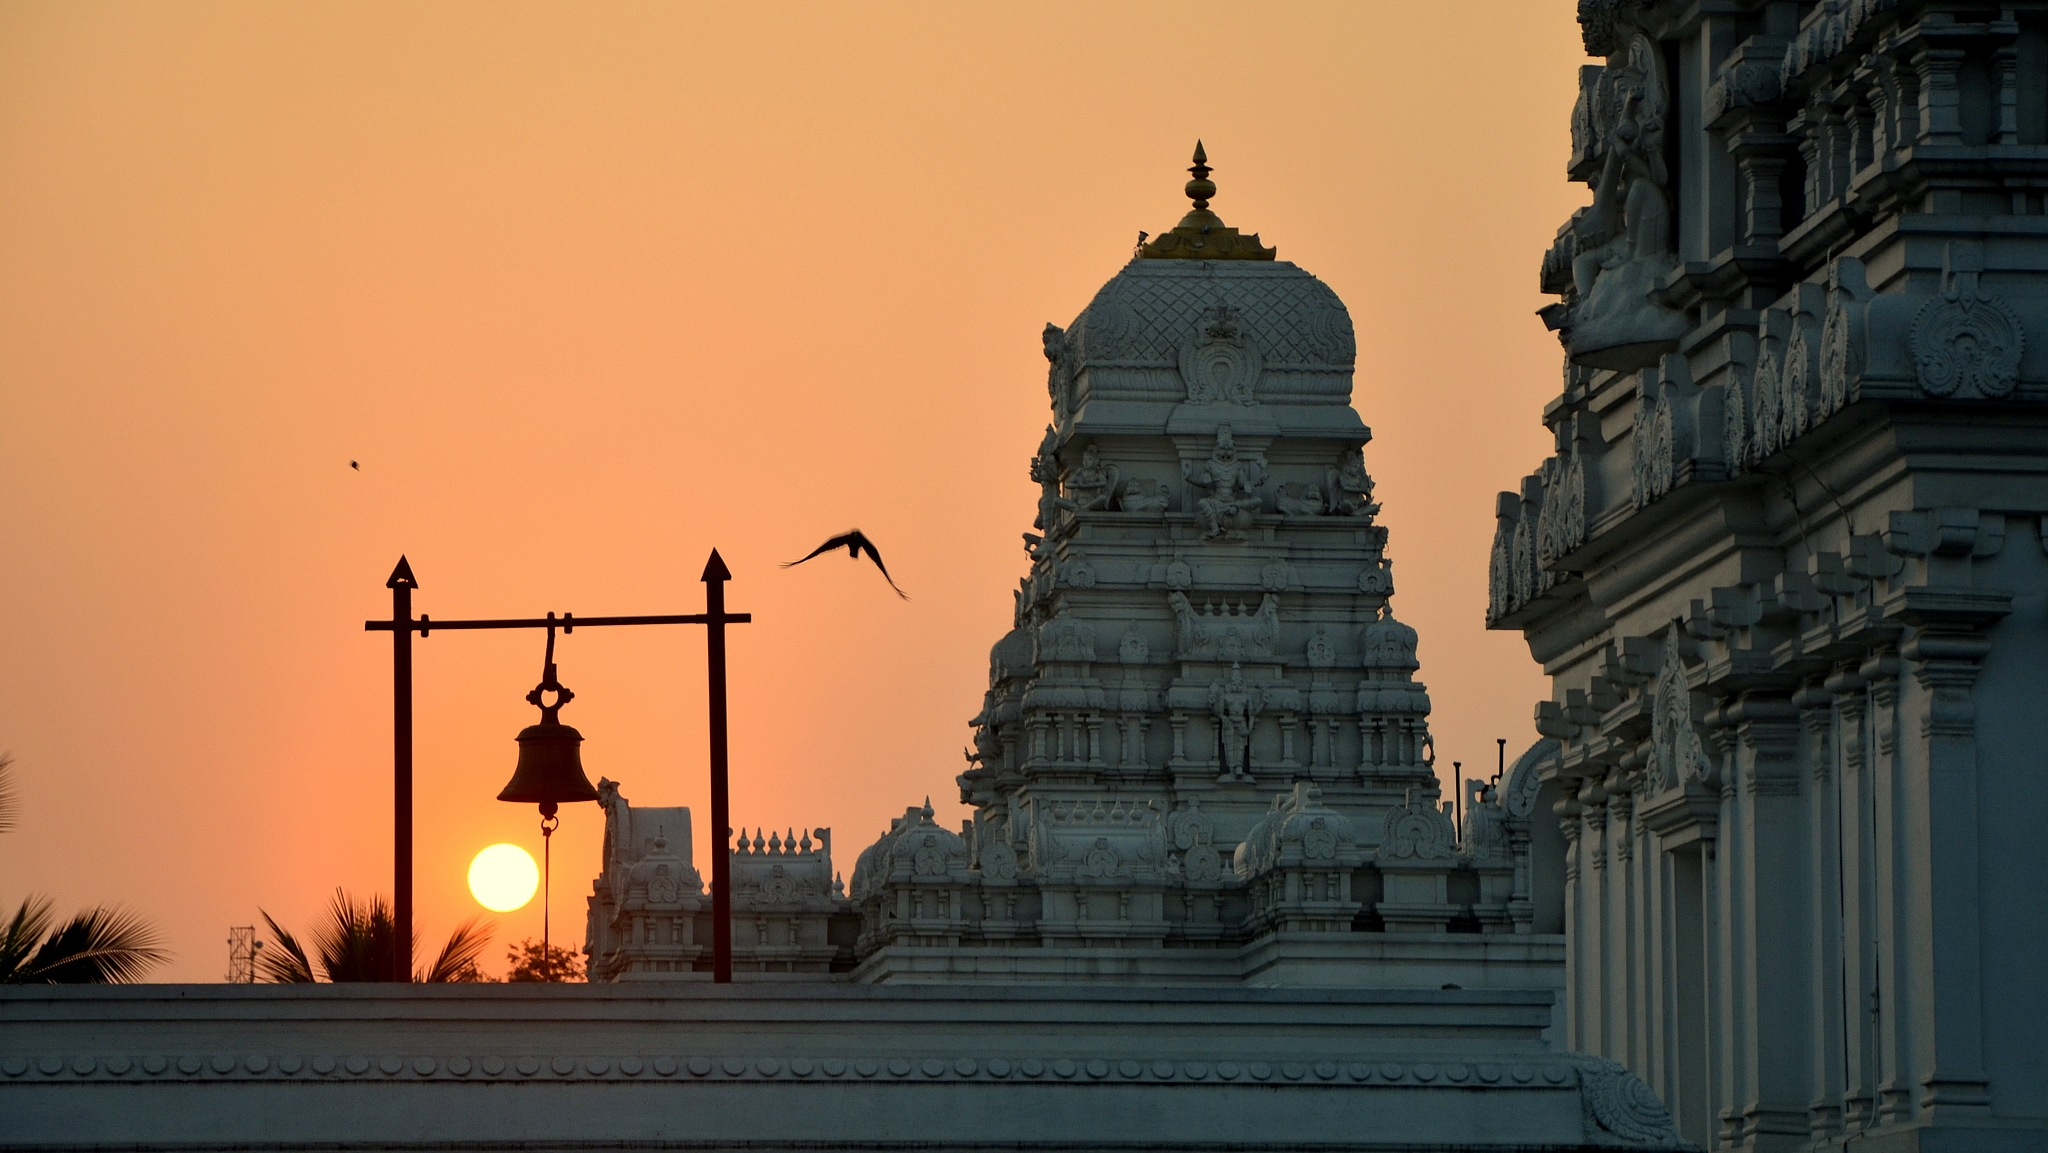 Evening Glance by Manabendra Bhattacharjee